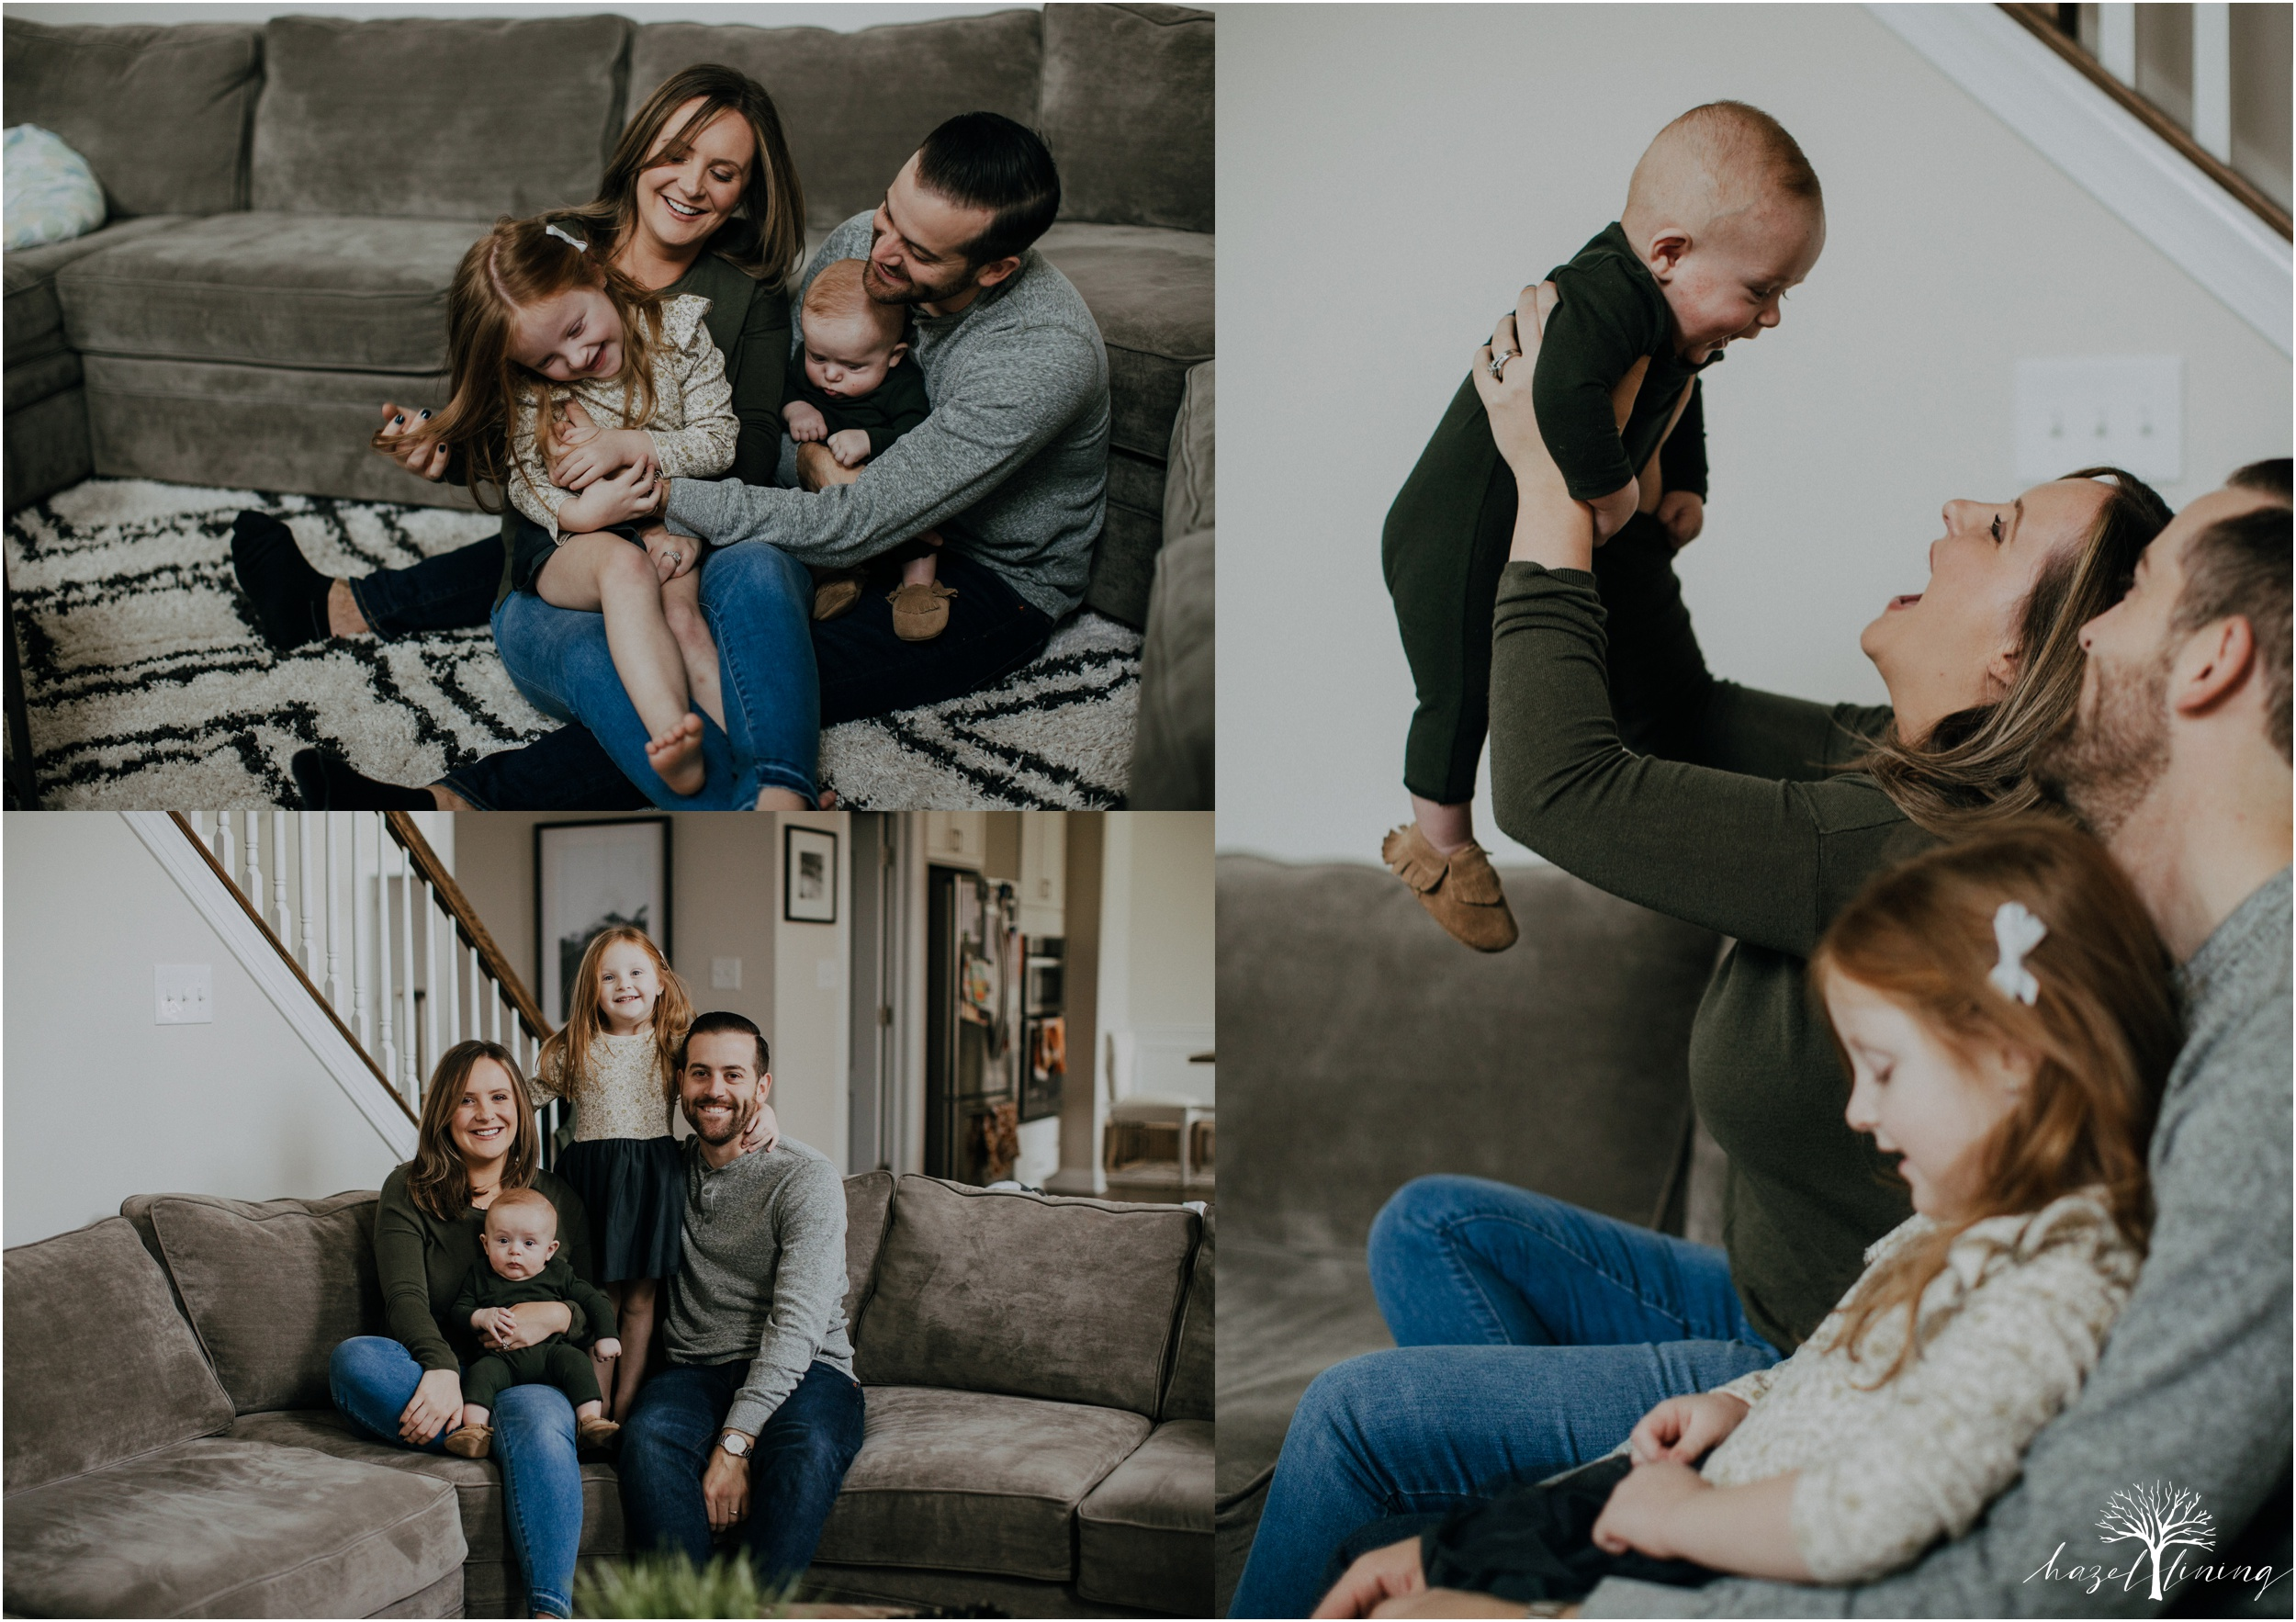 pellgrino-family-in-home-lifestyle-family-portraits_0041.jpg